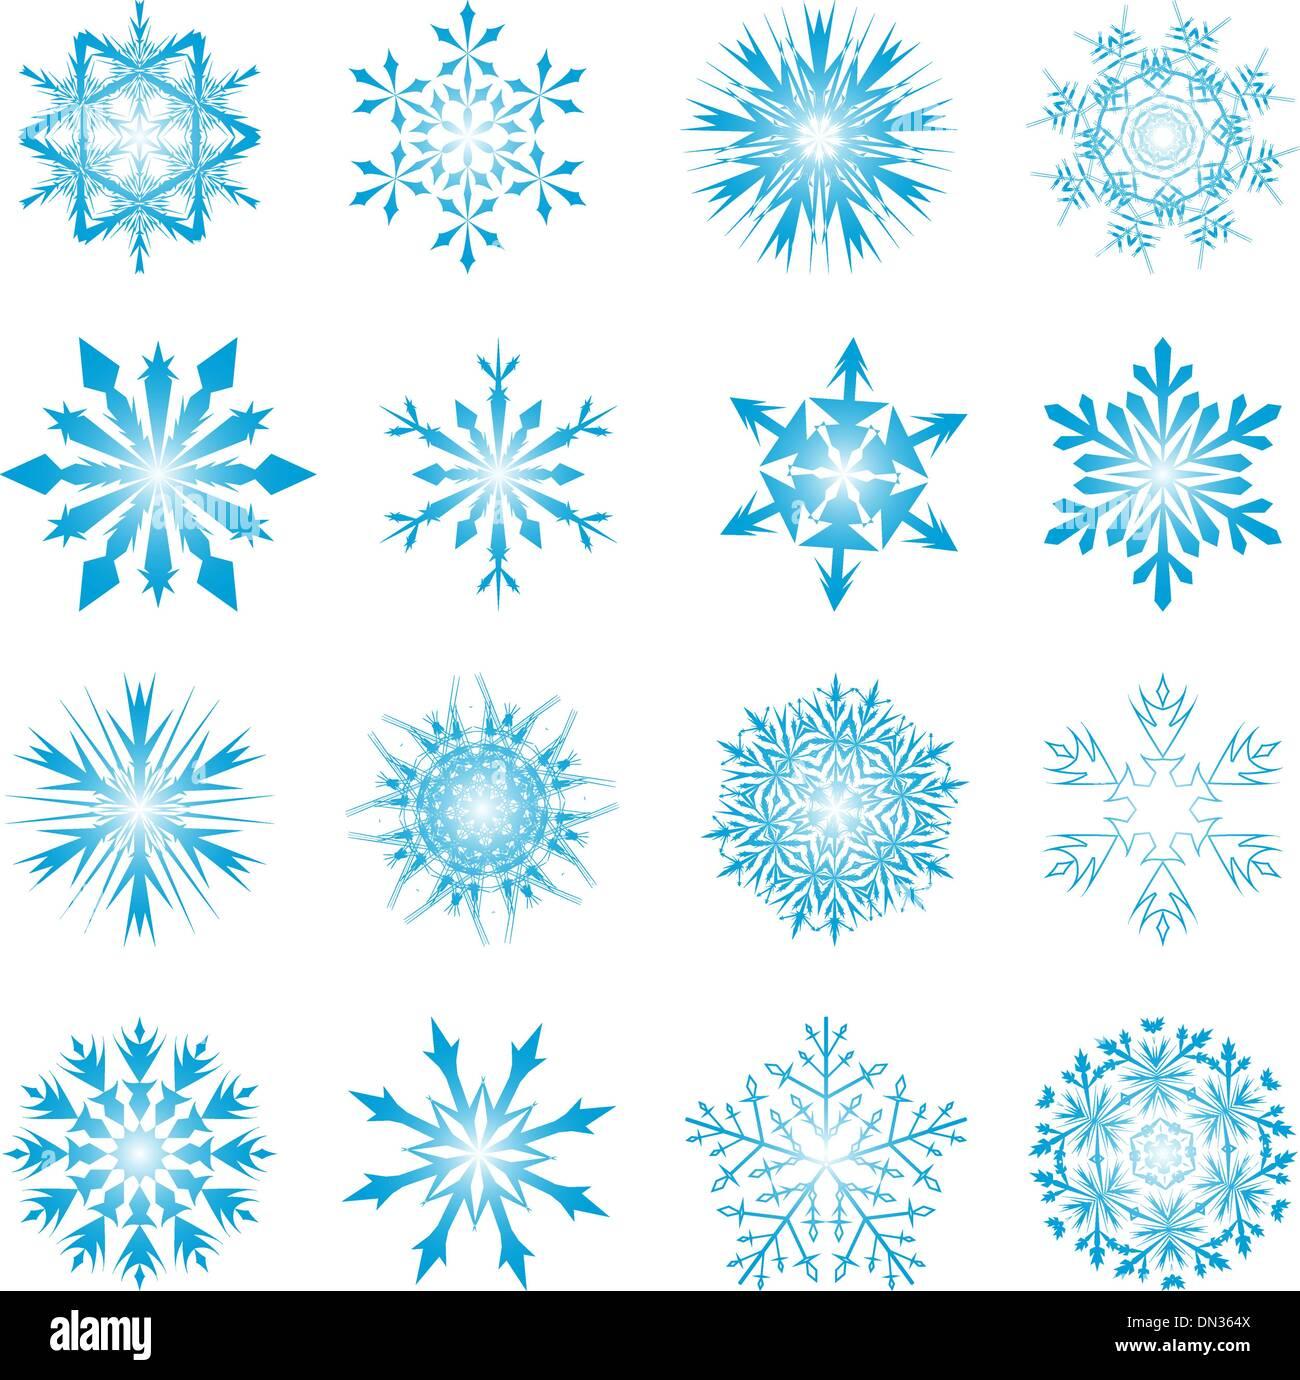 Snowflake Set - Stock Image